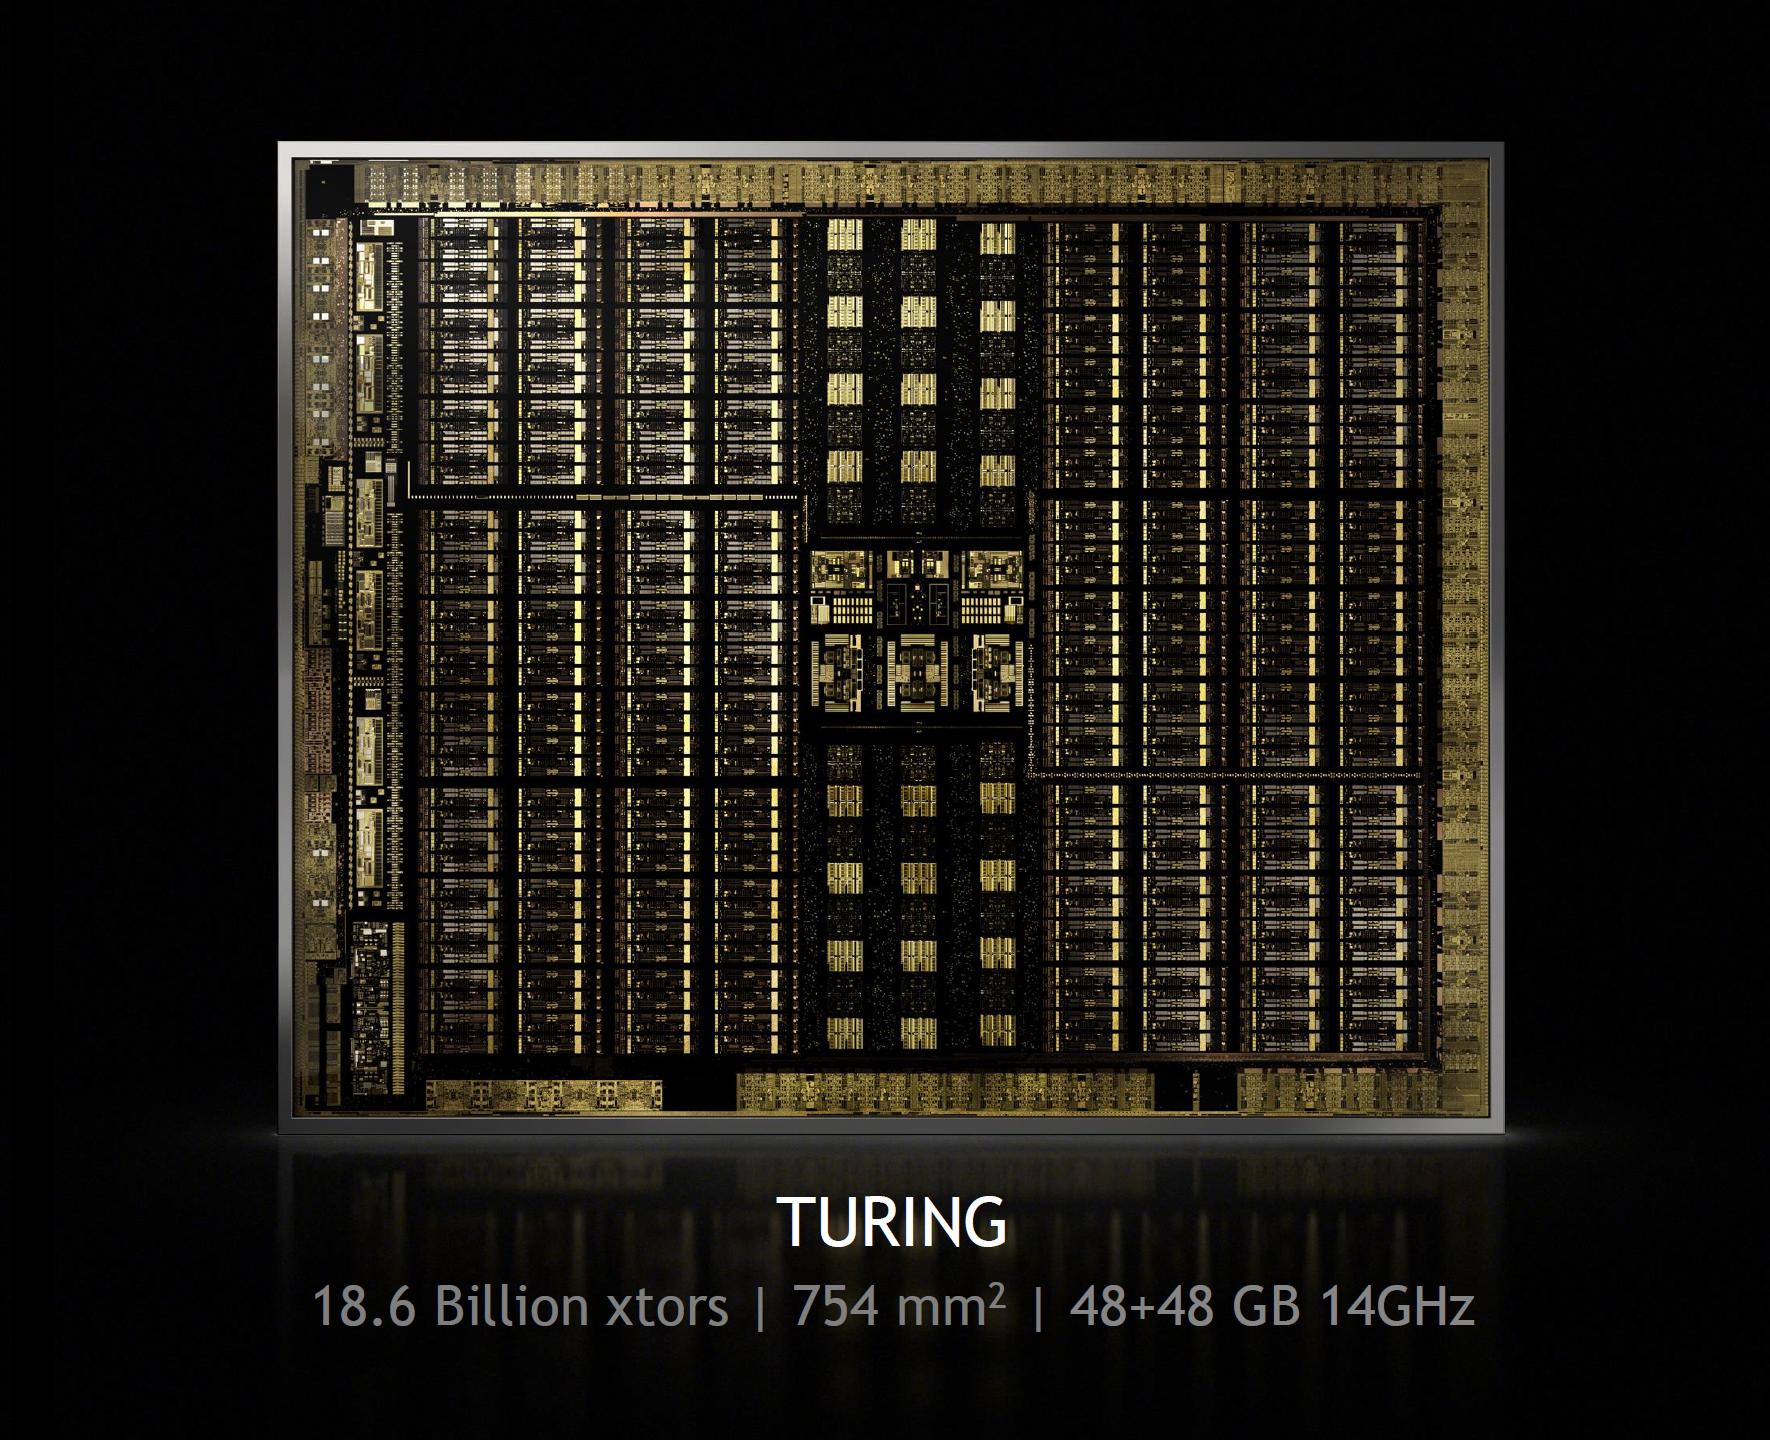 NVIDIA GeForce RTX 2080 Ti Turing TU102 GPU Die Pictured, It's Huge